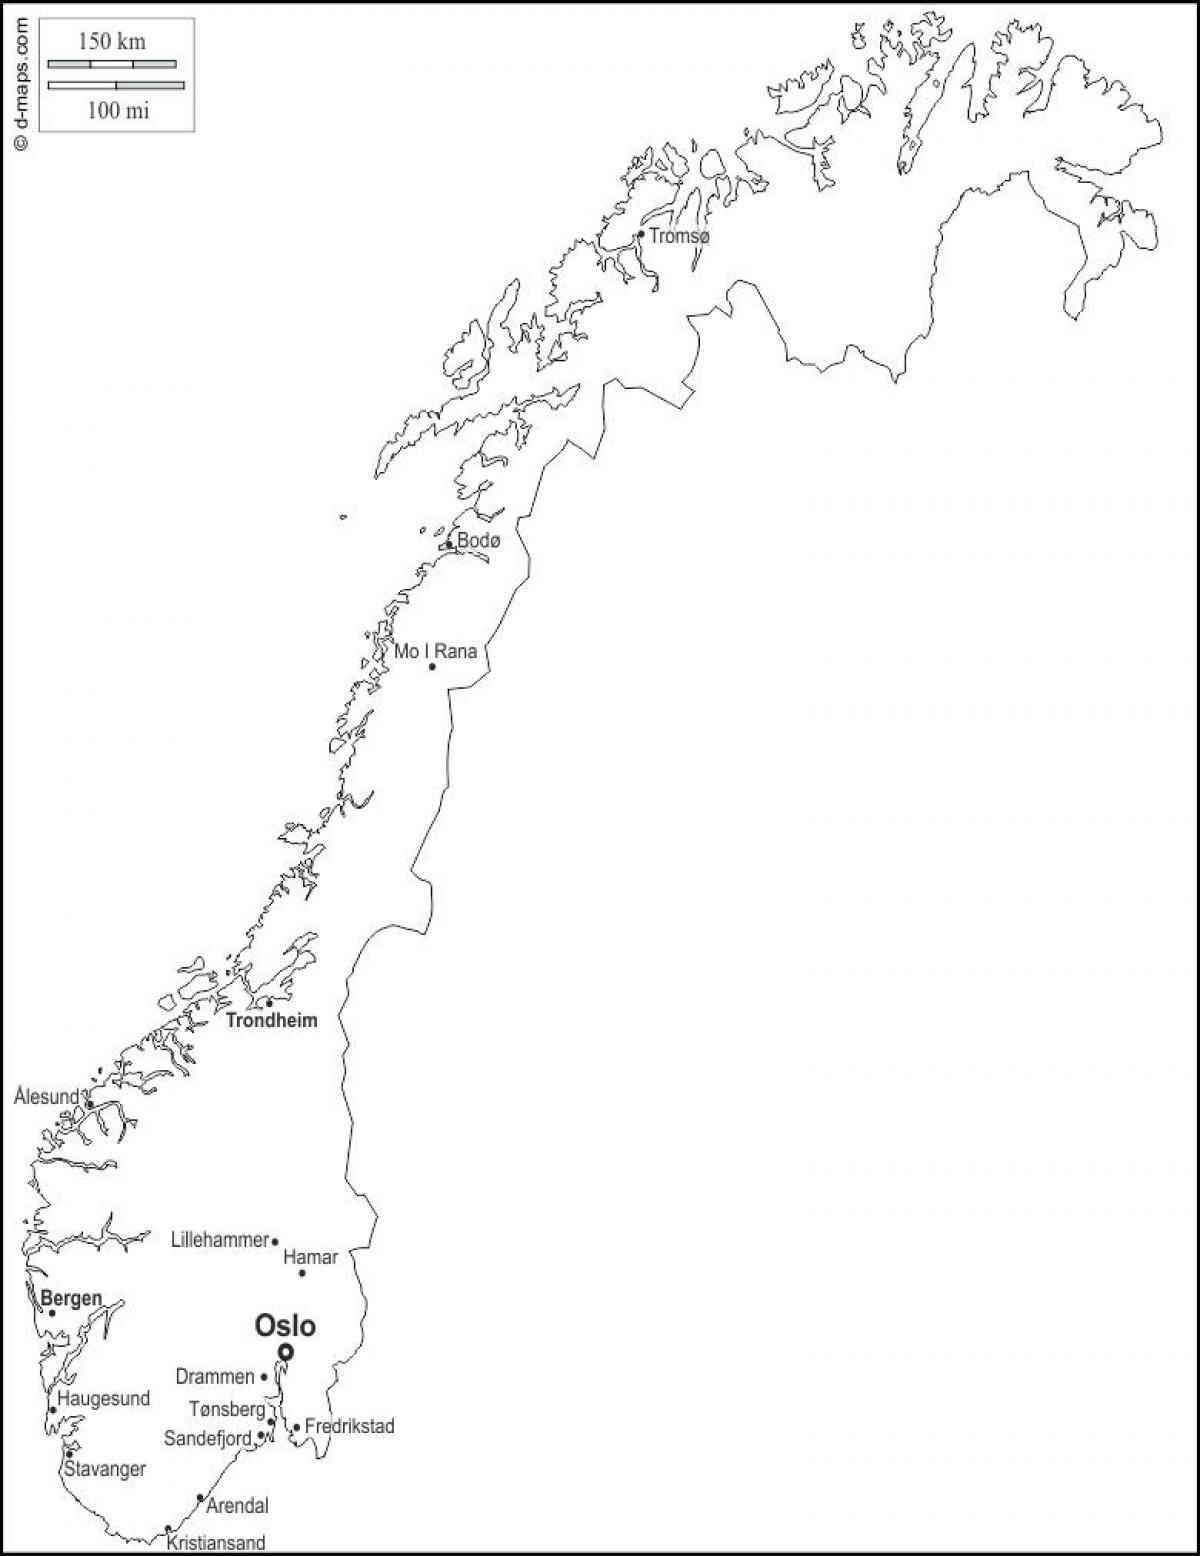 Karta Norge Stavanger.Norvegija Tuscias Map Tuscias Zemėlapis Norvegija Siaurės